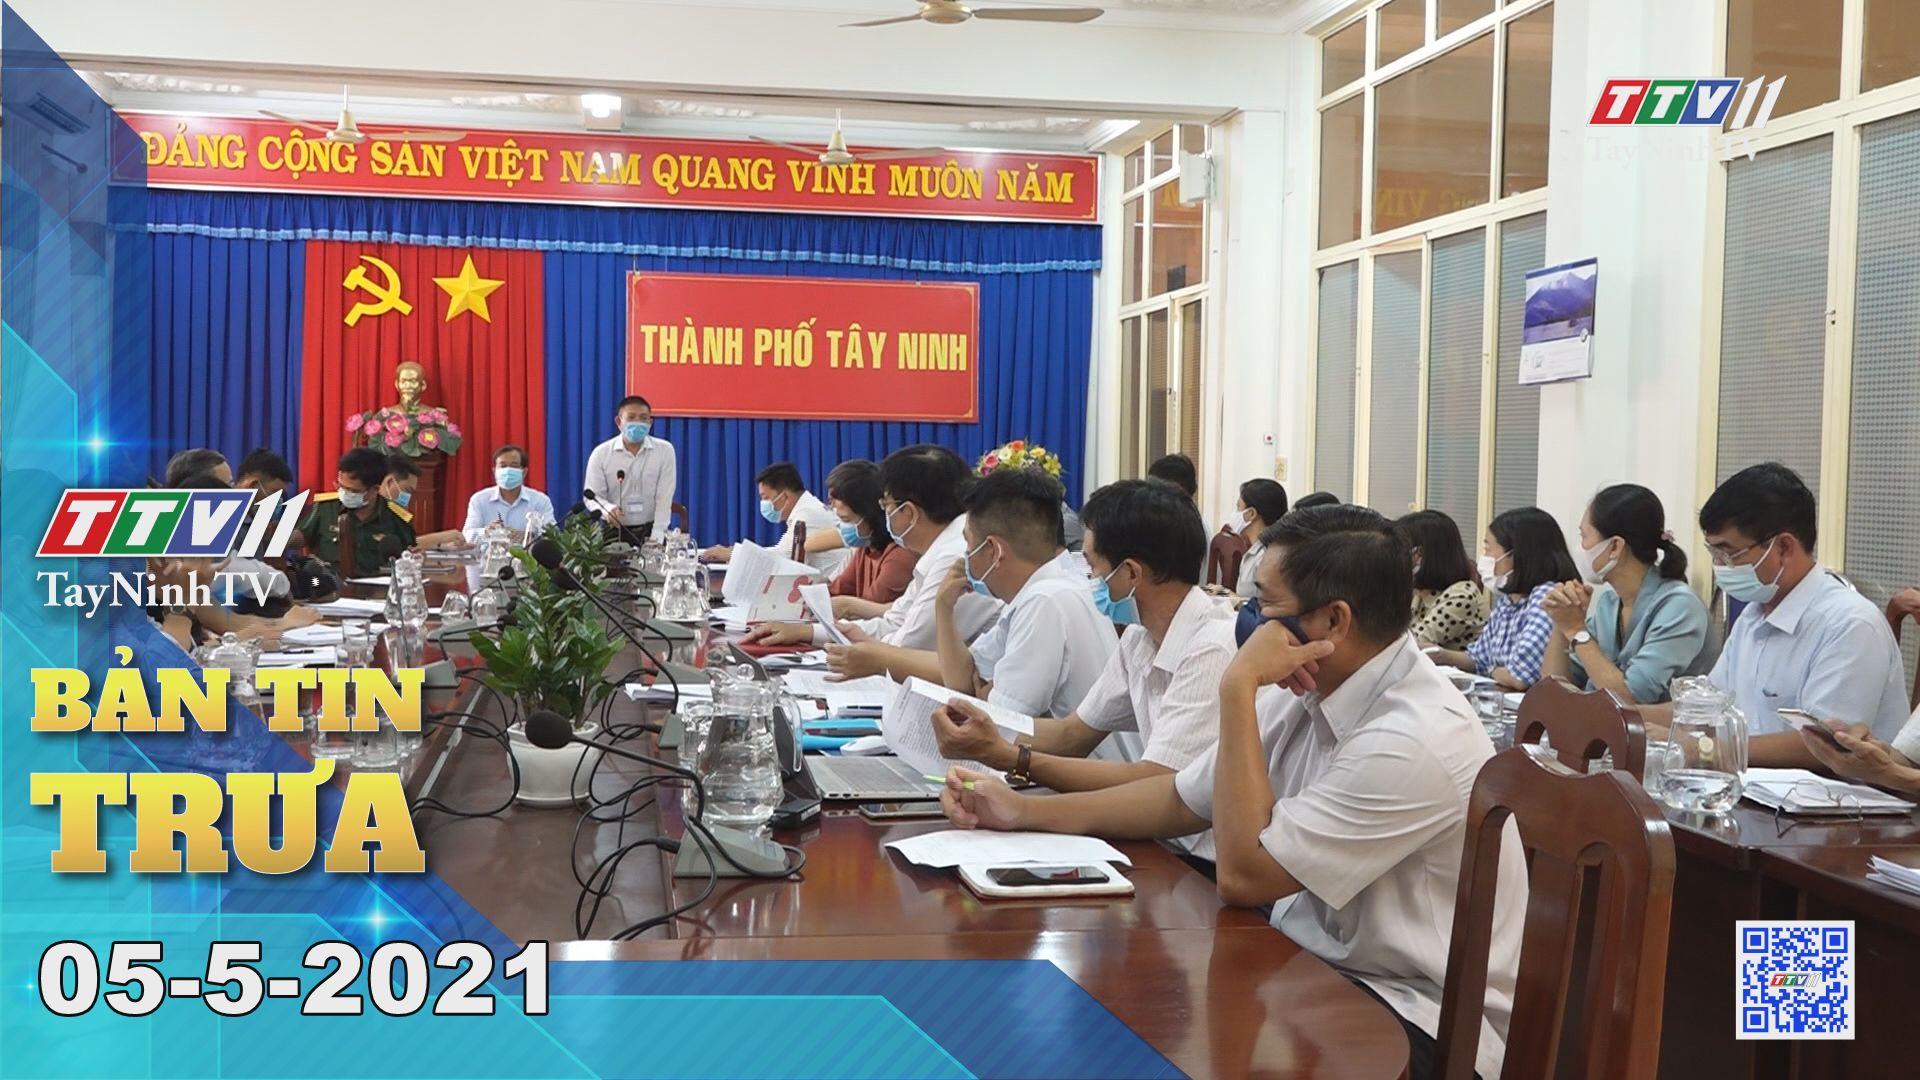 Bản tin trưa 05-5-2021 | Tin tức hôm nay | TayNinhTV